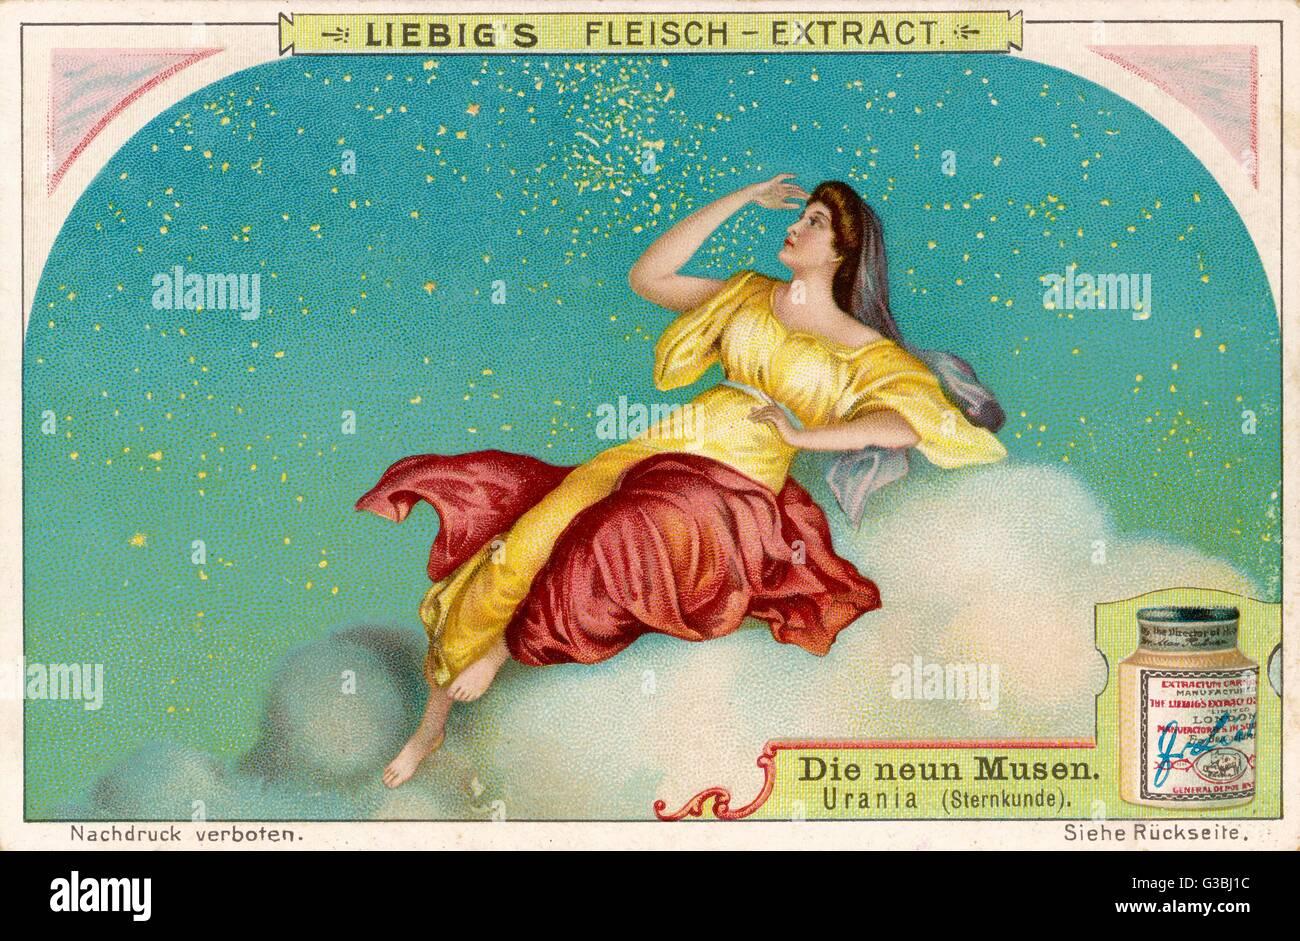 Urania muse of astronomy - Stock Image